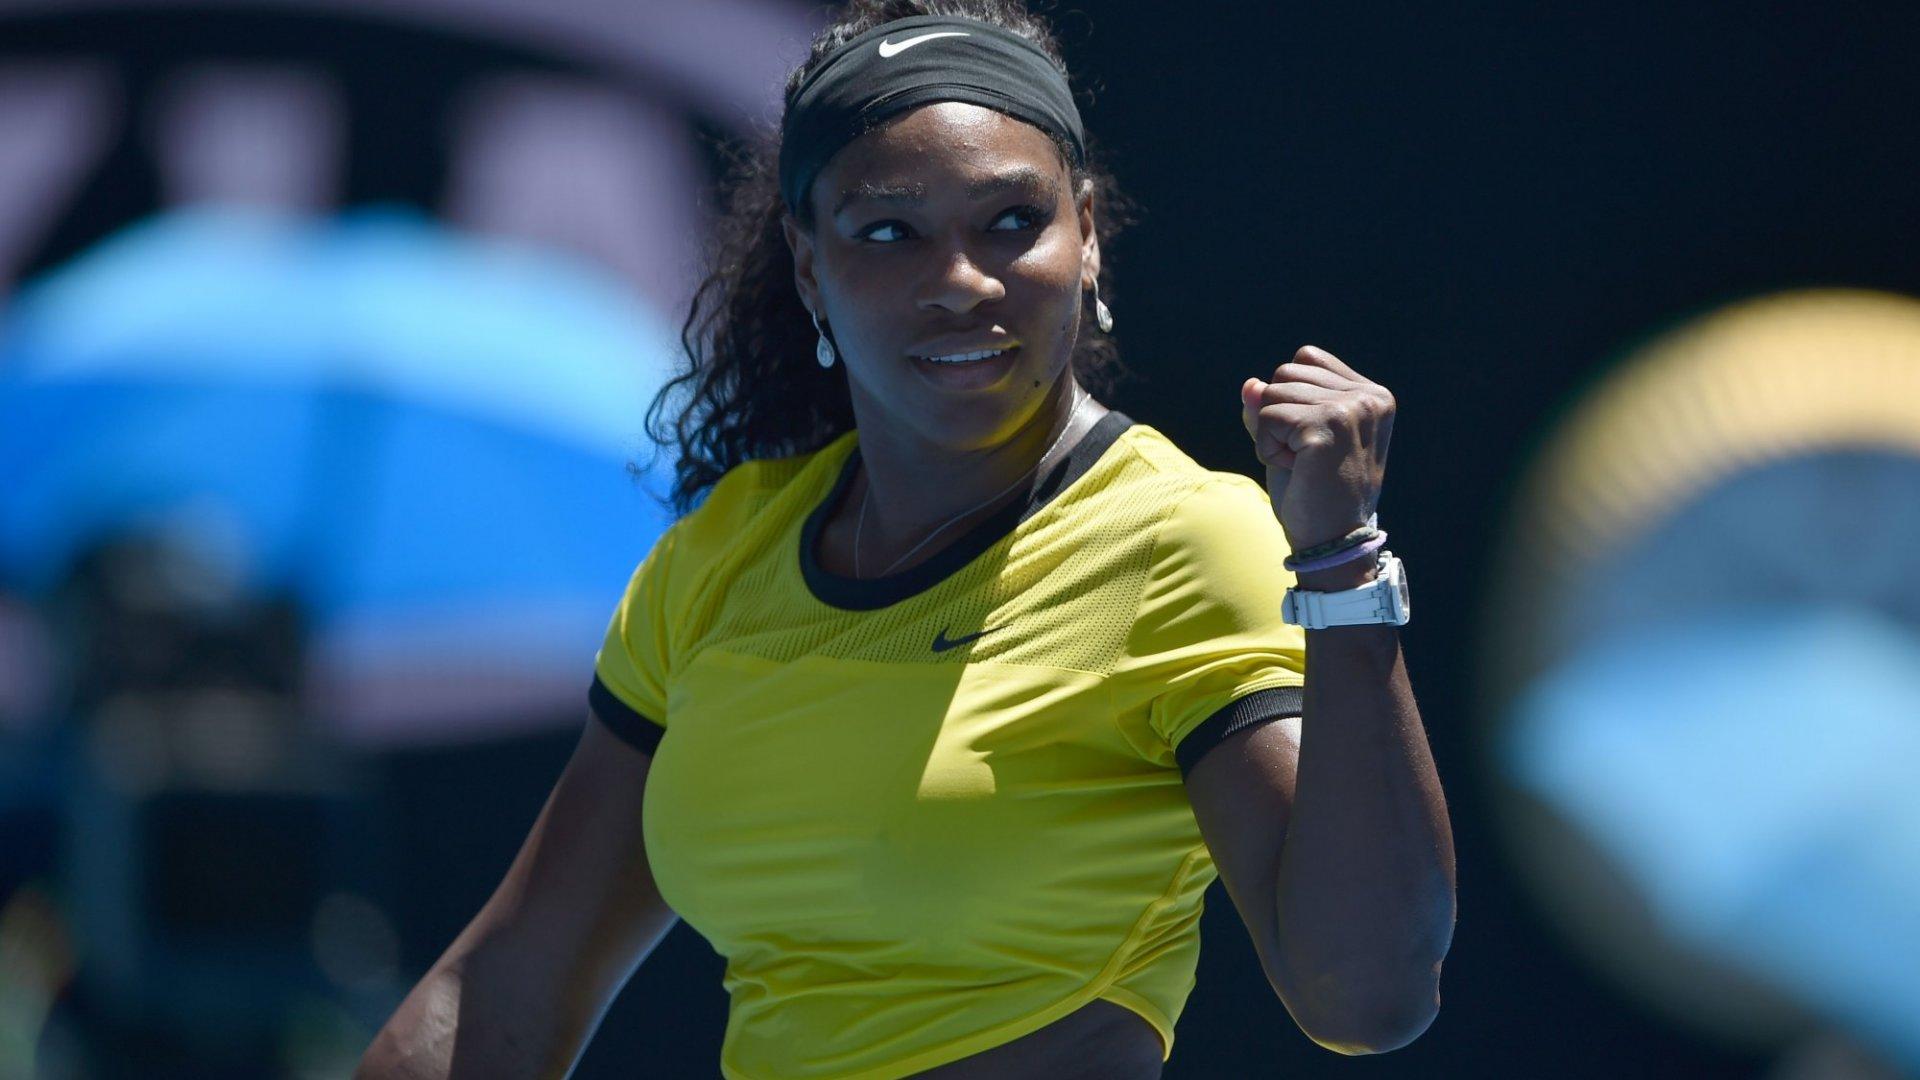 Tennis Star Serena Williams Joins SurveyMonkey's Board of Directors